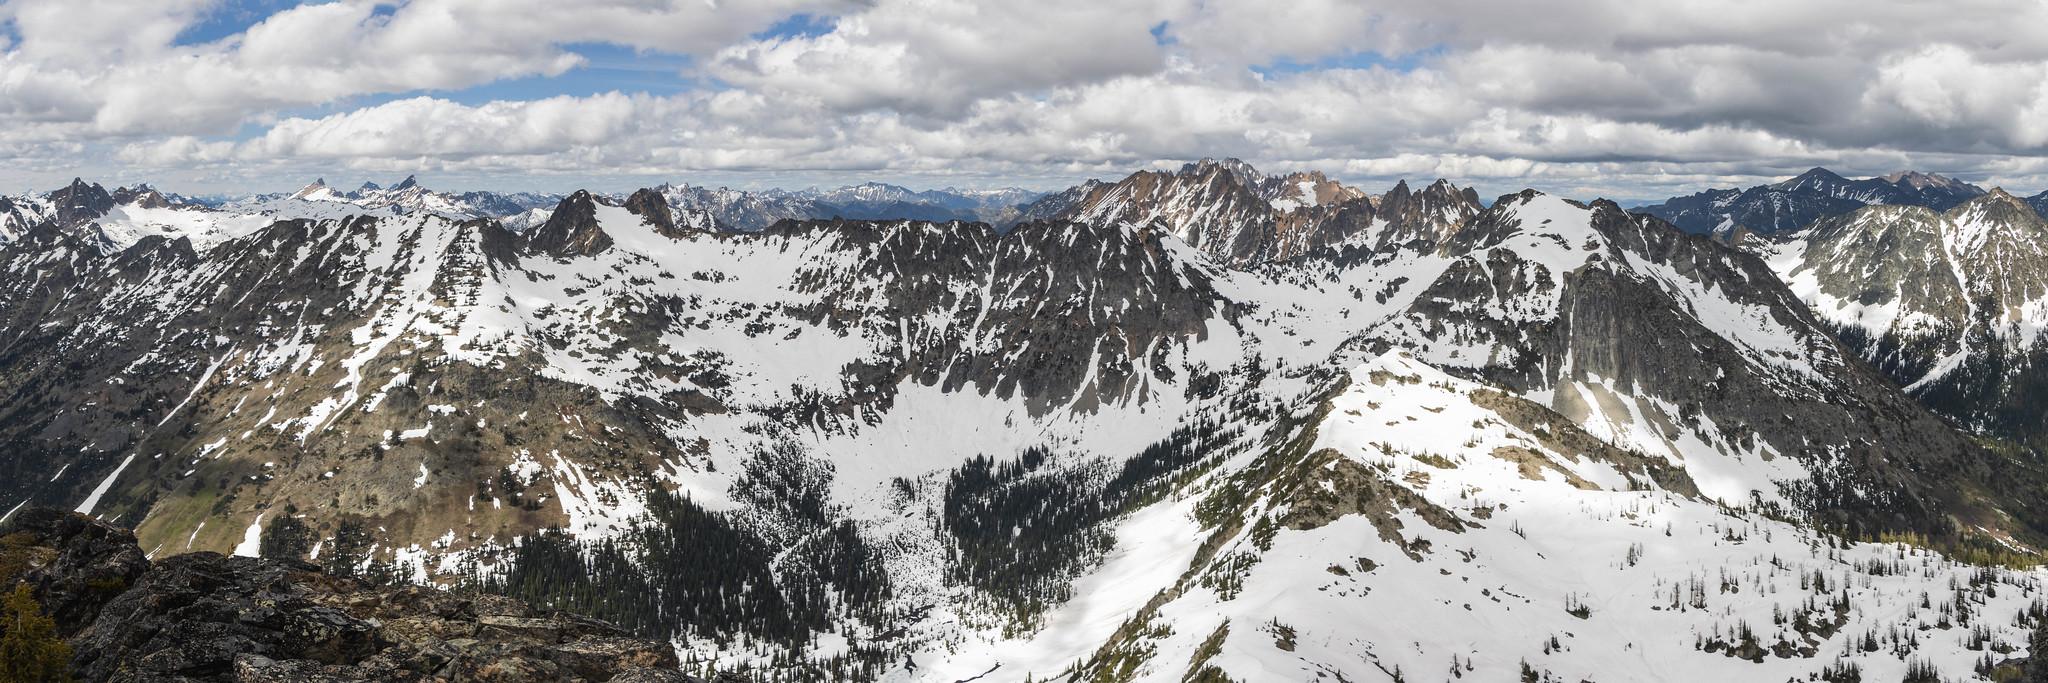 Northeastern panoramic view from Switchblade Peak